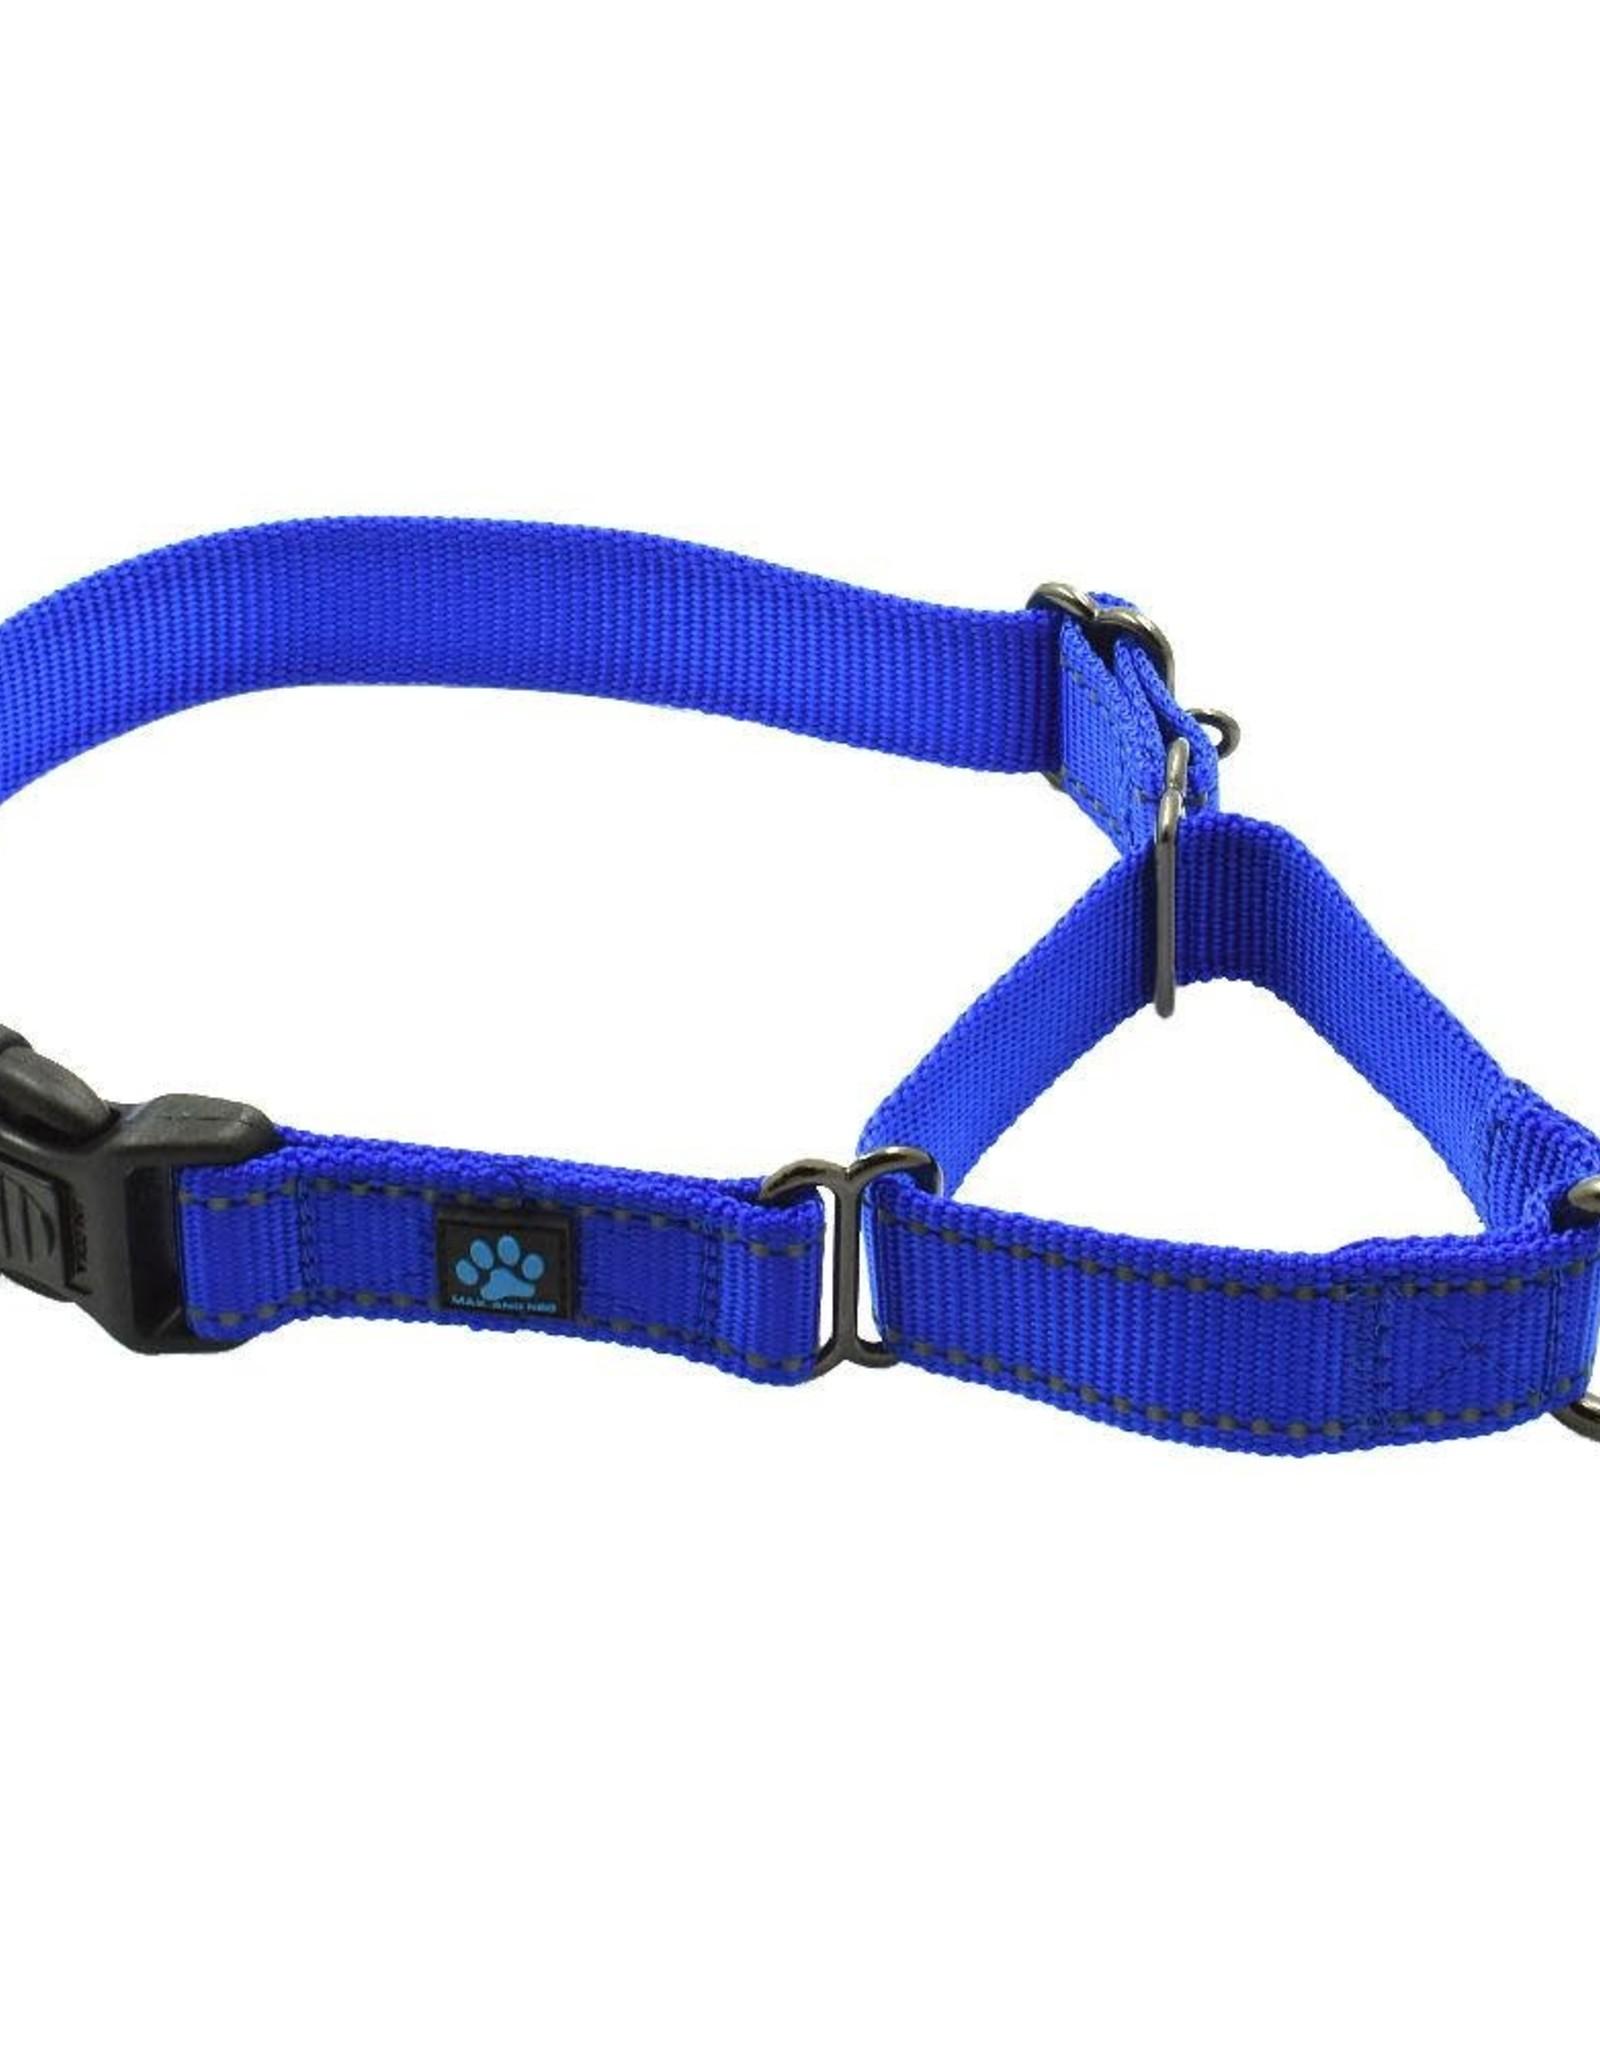 Max & Neo Max & Neo Collars - XS Blue Martingale